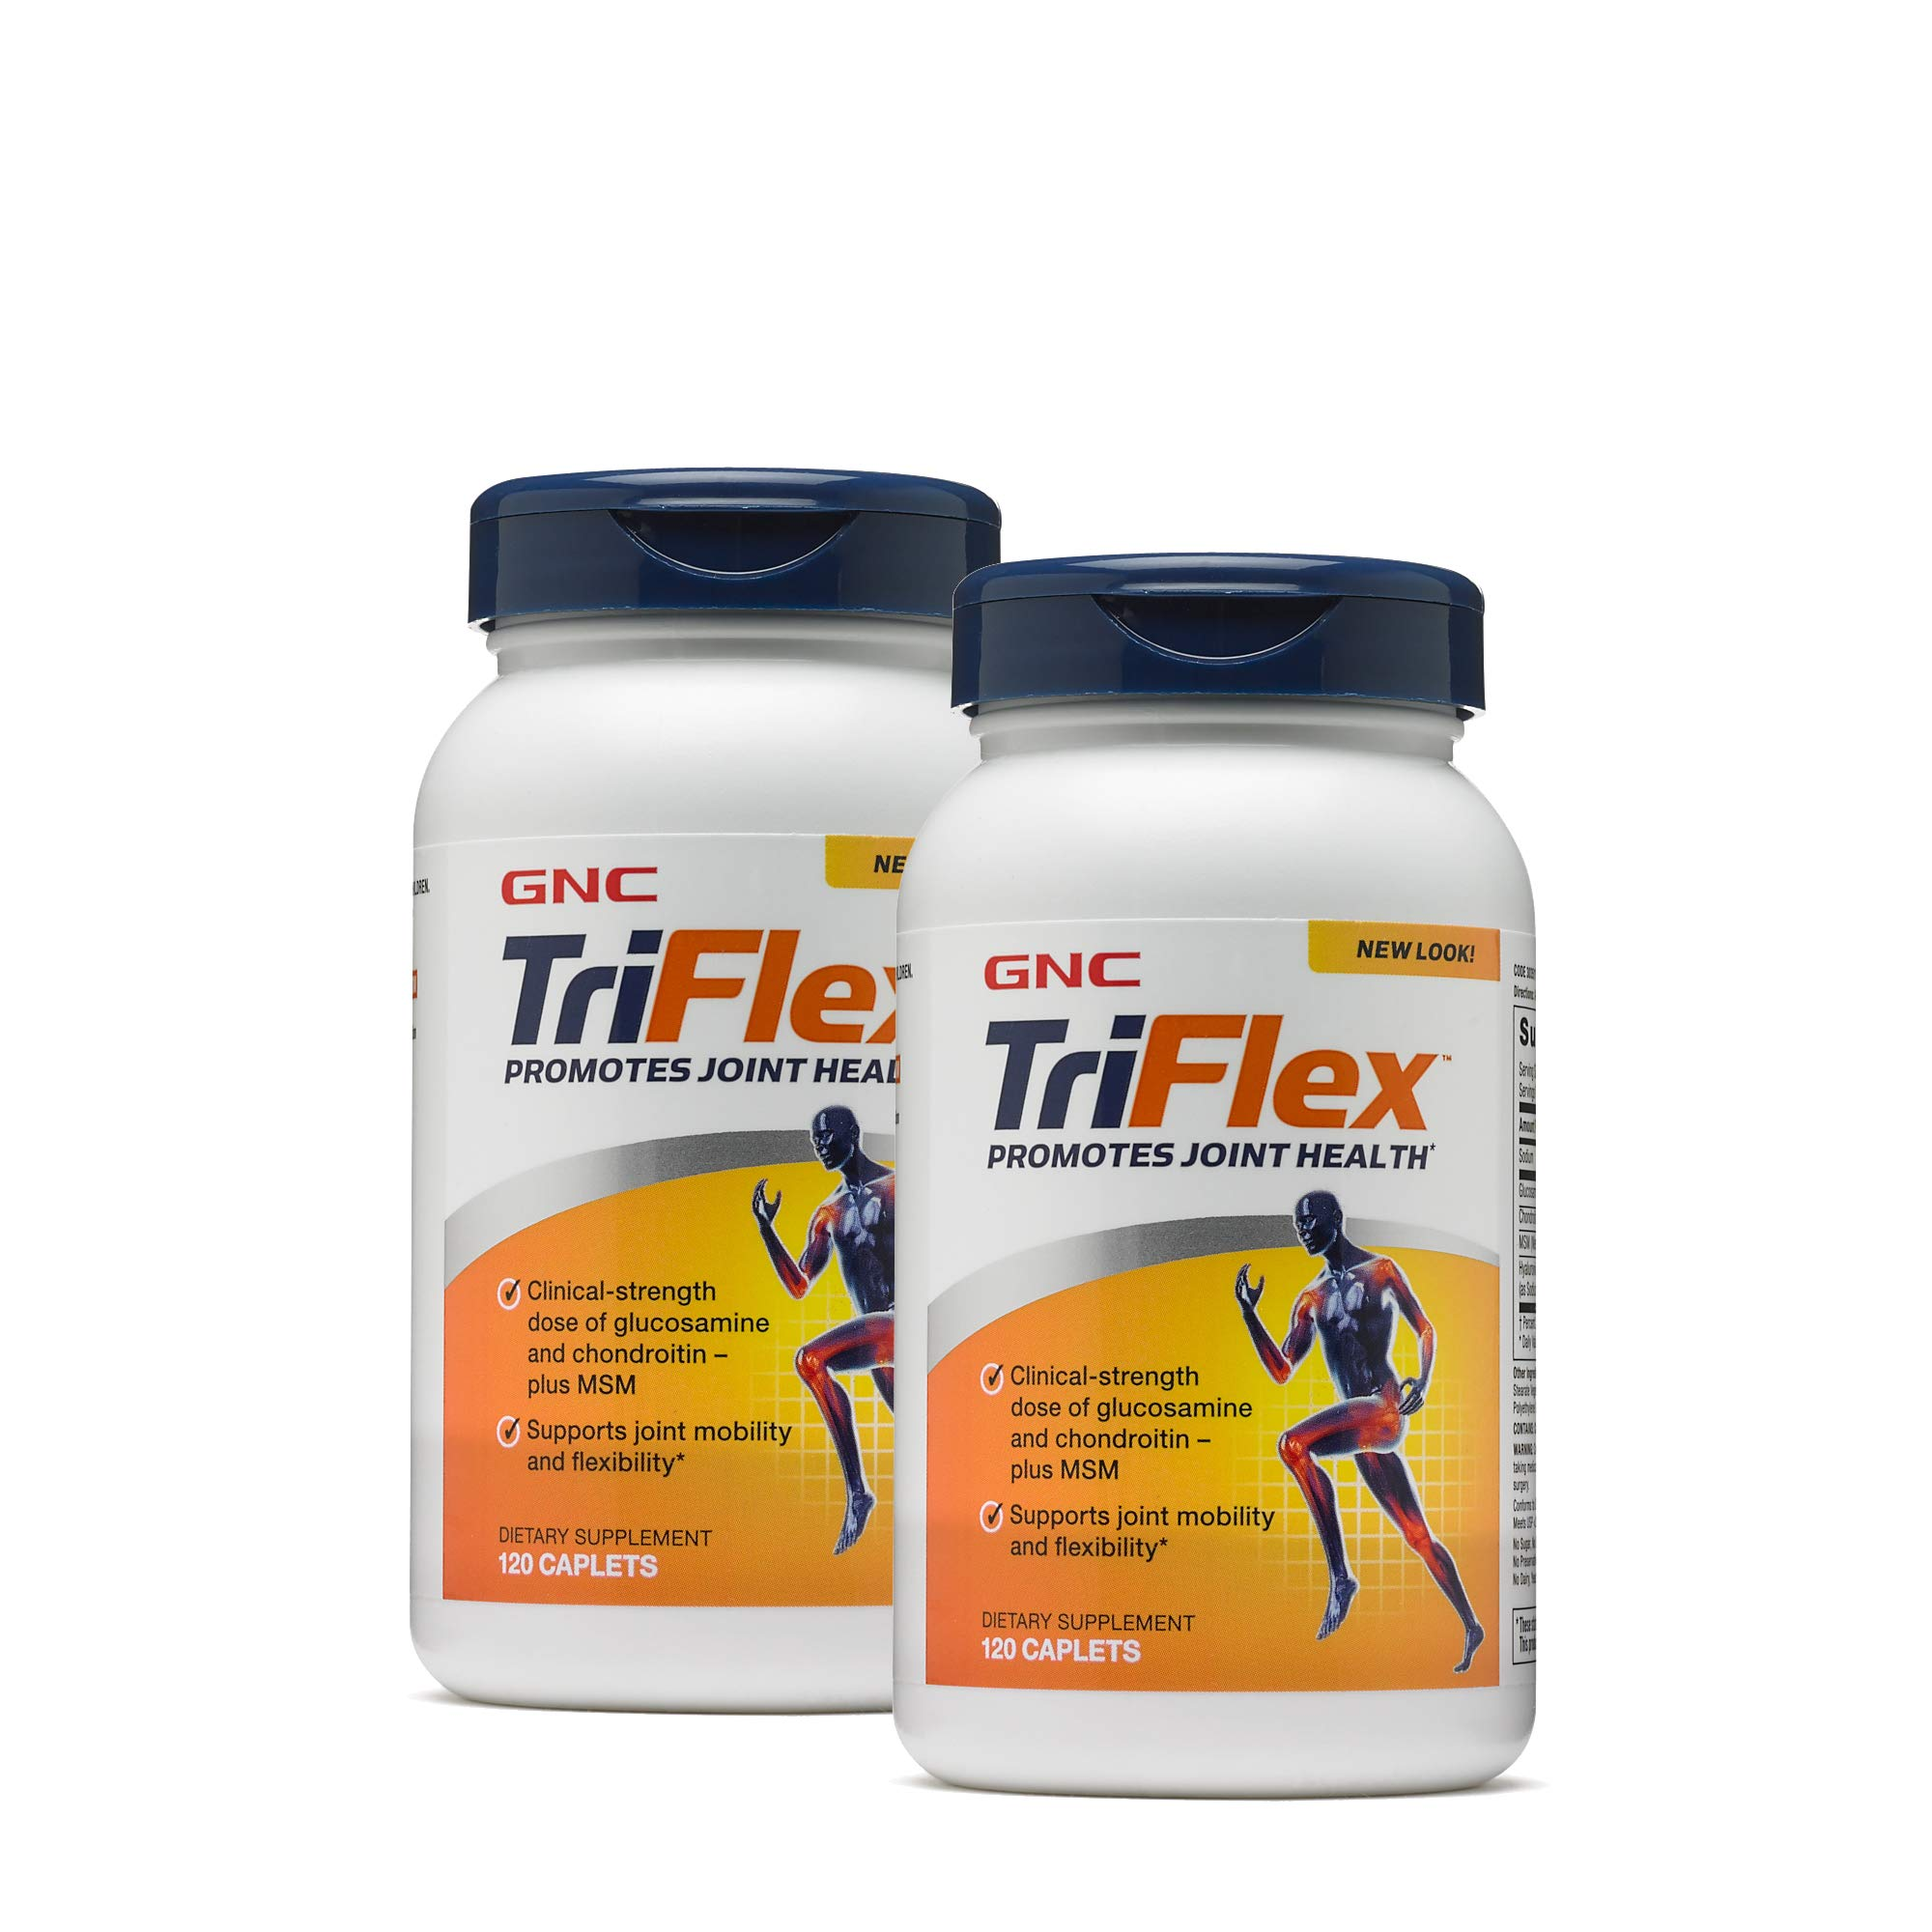 GNC TriFlex - Twin Pack